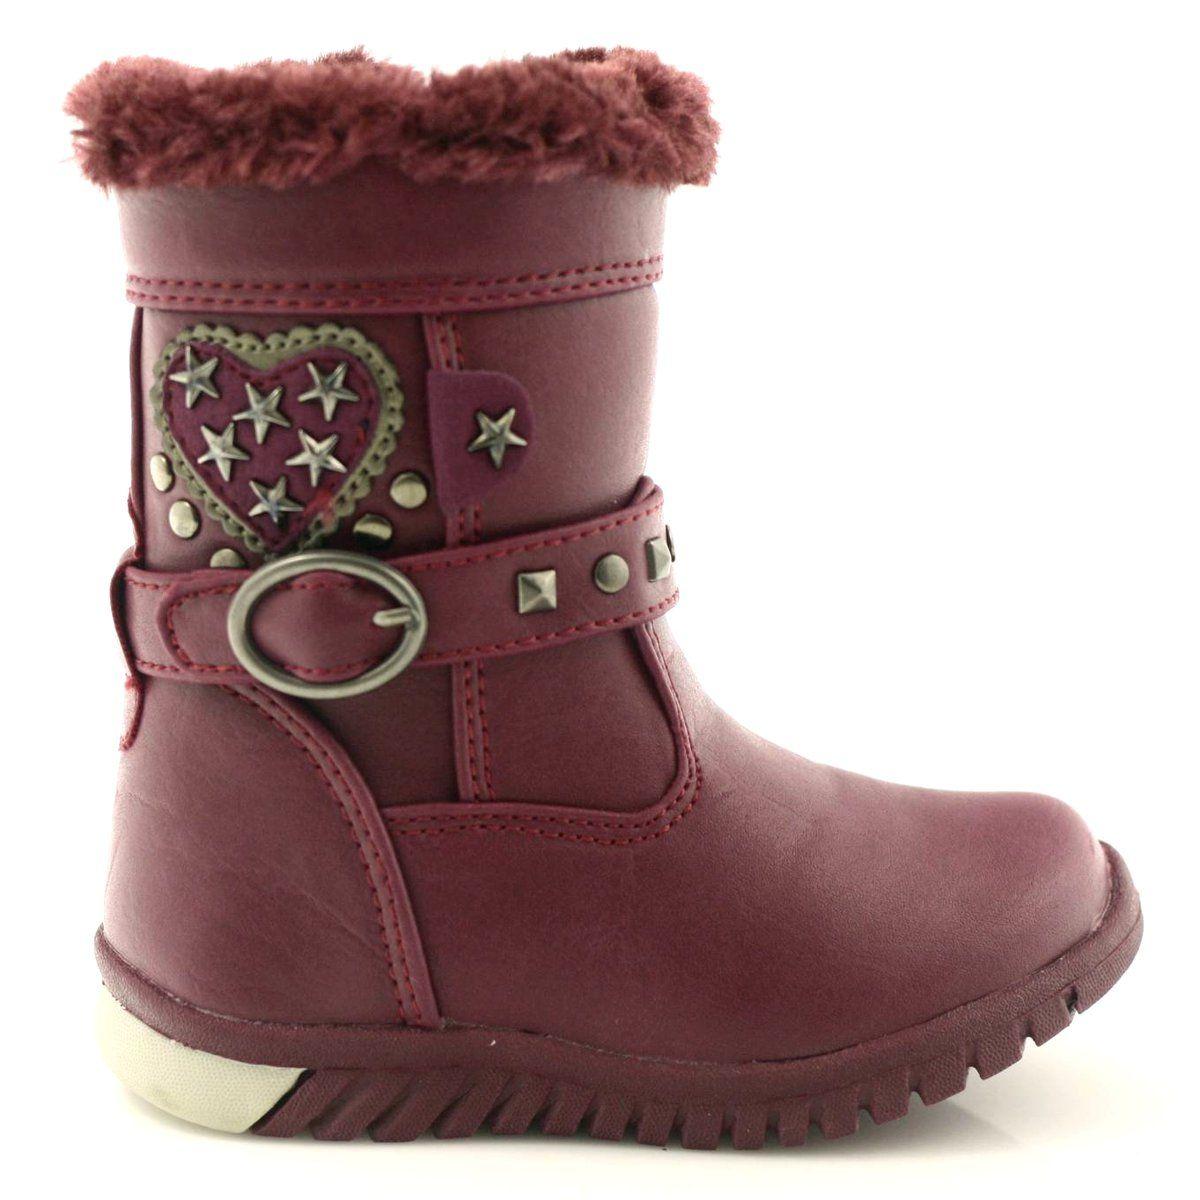 American Club Kozaczki Dziewczece American 86158 Bordowe Wielokolorowe Boots Ugg Boots Shoes